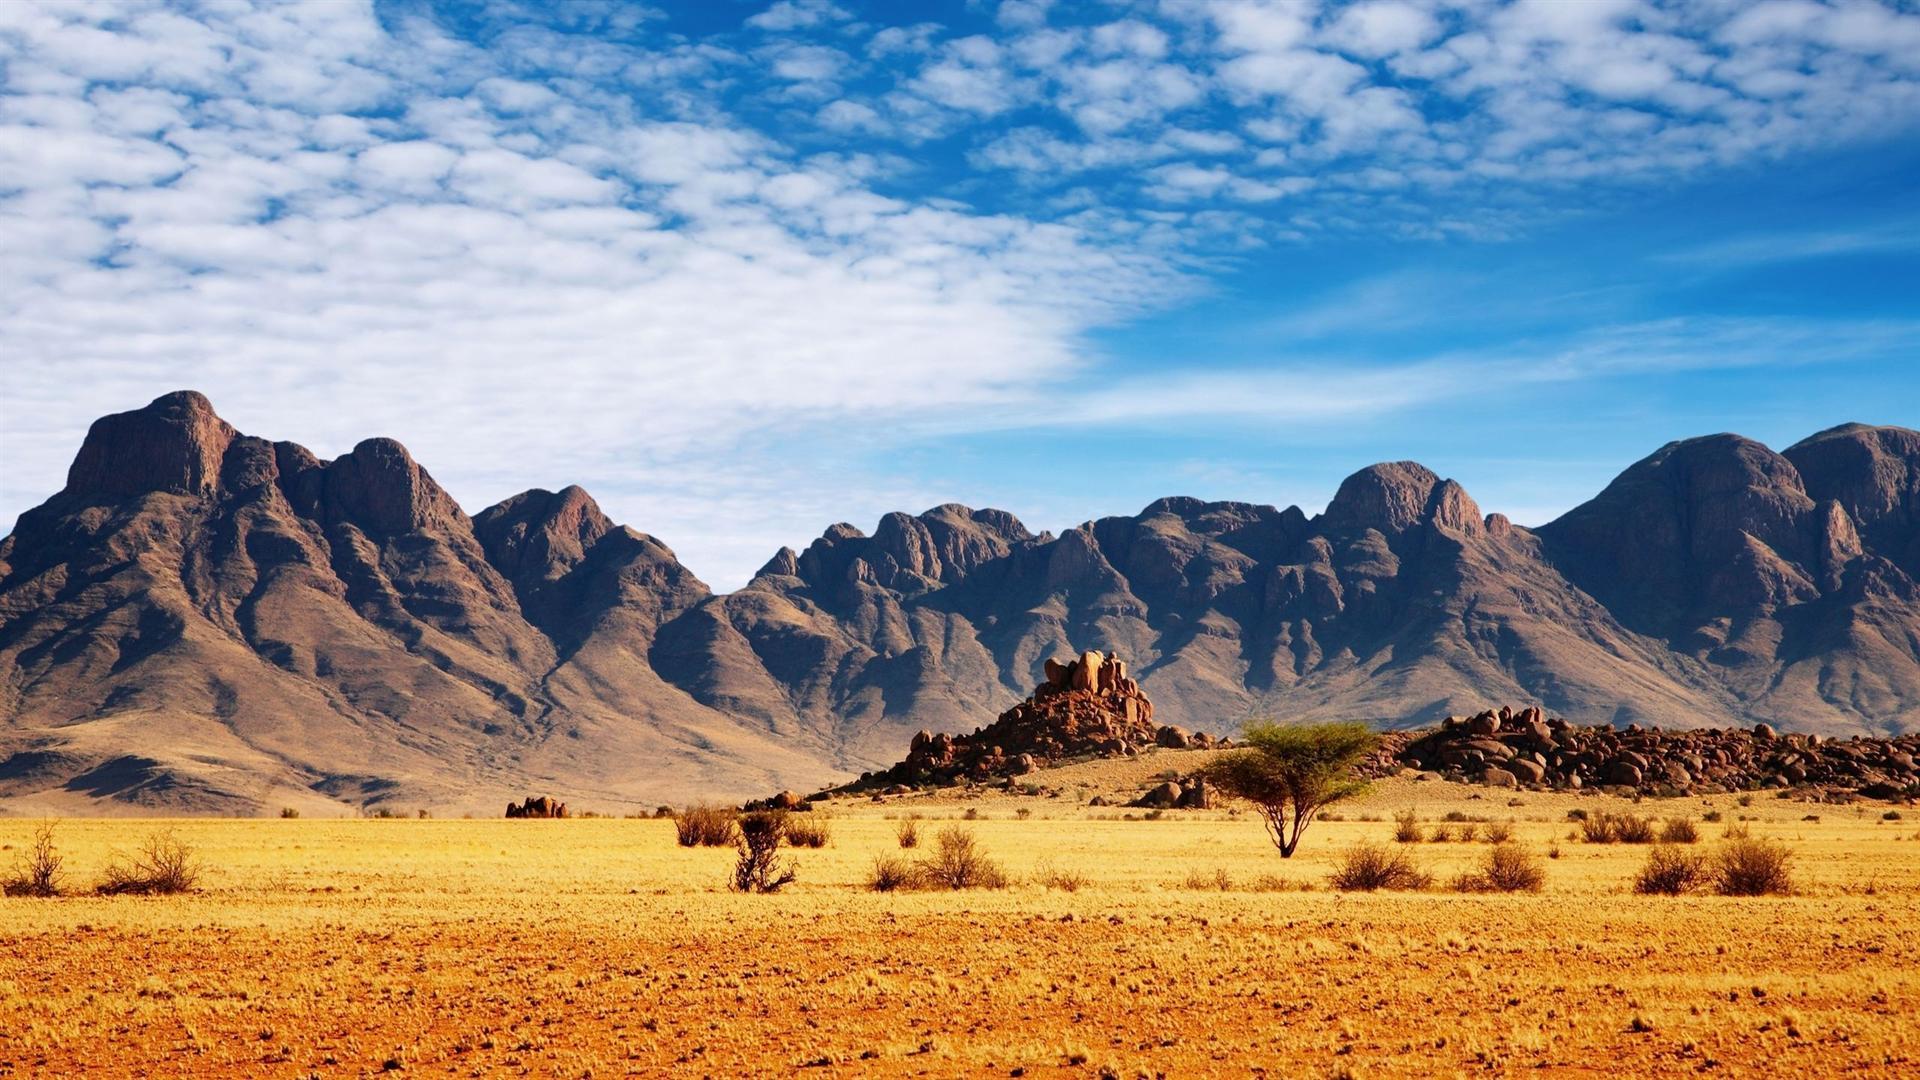 Stunning-Safari-Wallpaper.jpg